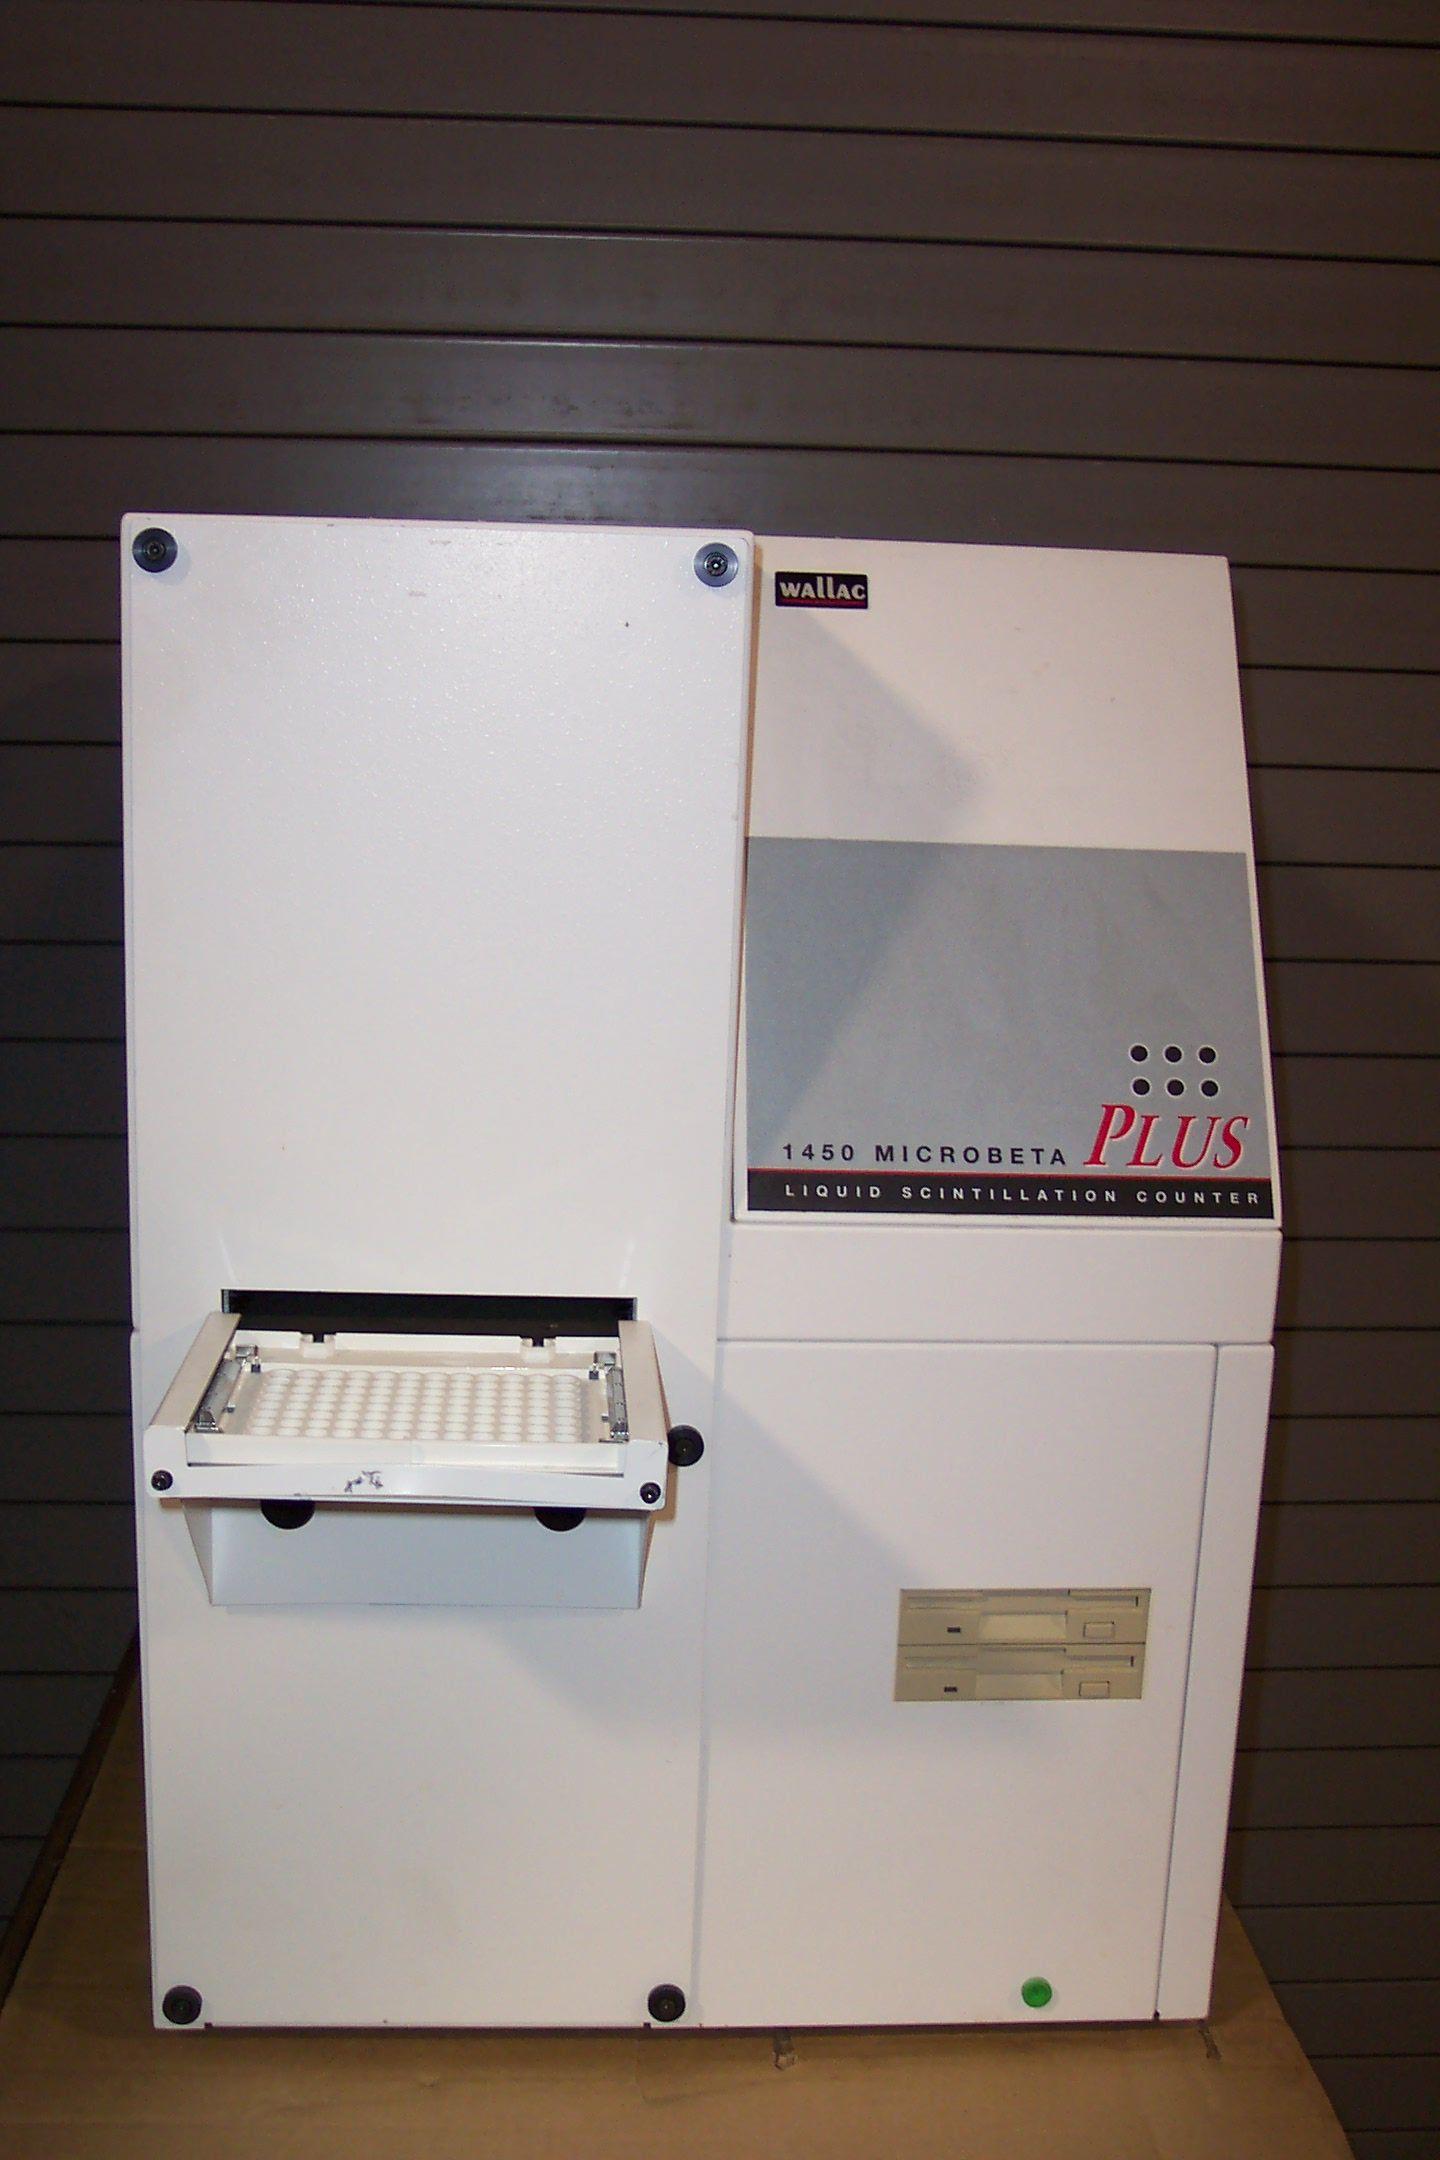 Wallac Liquid Scintillation Counter Model 1450-011